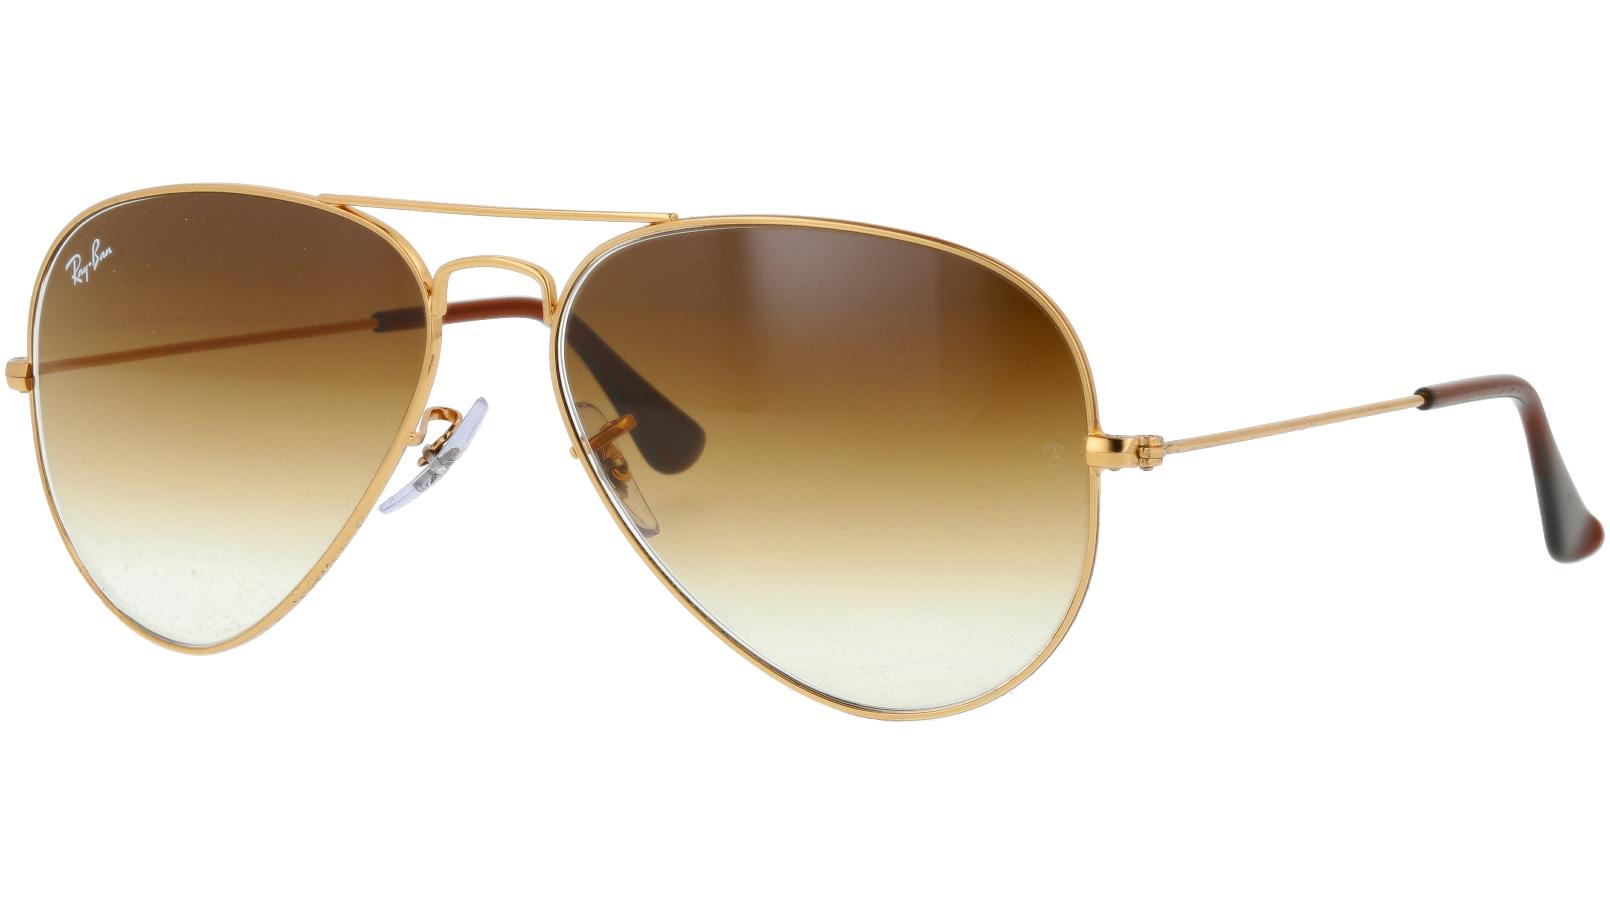 Ray-Ban RB3025 001/51 58 Arista Pilot Sunglasses